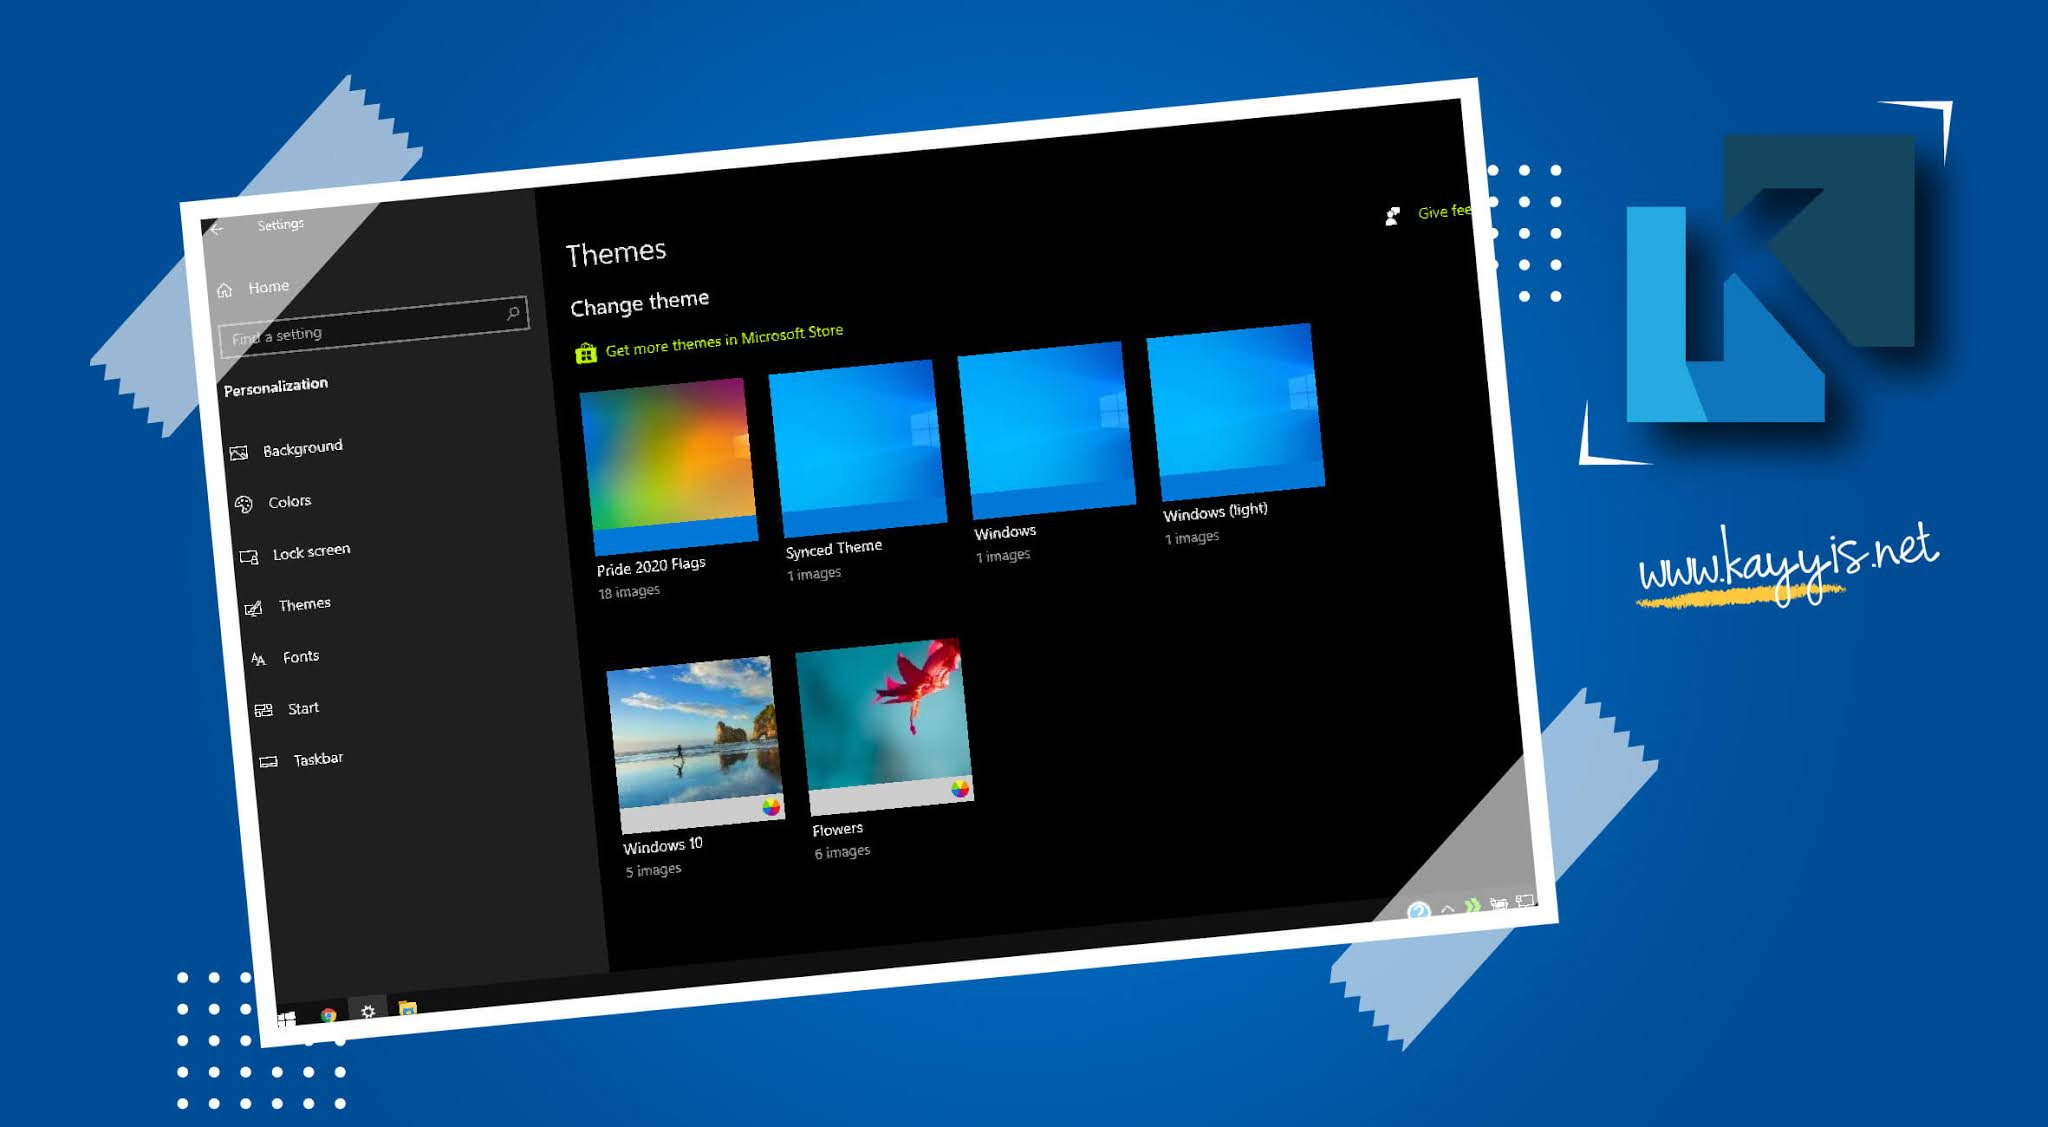 Memasang dan Mengganti Tema Baru di Windows 10 dari Microsoft dan Non-Microsoft